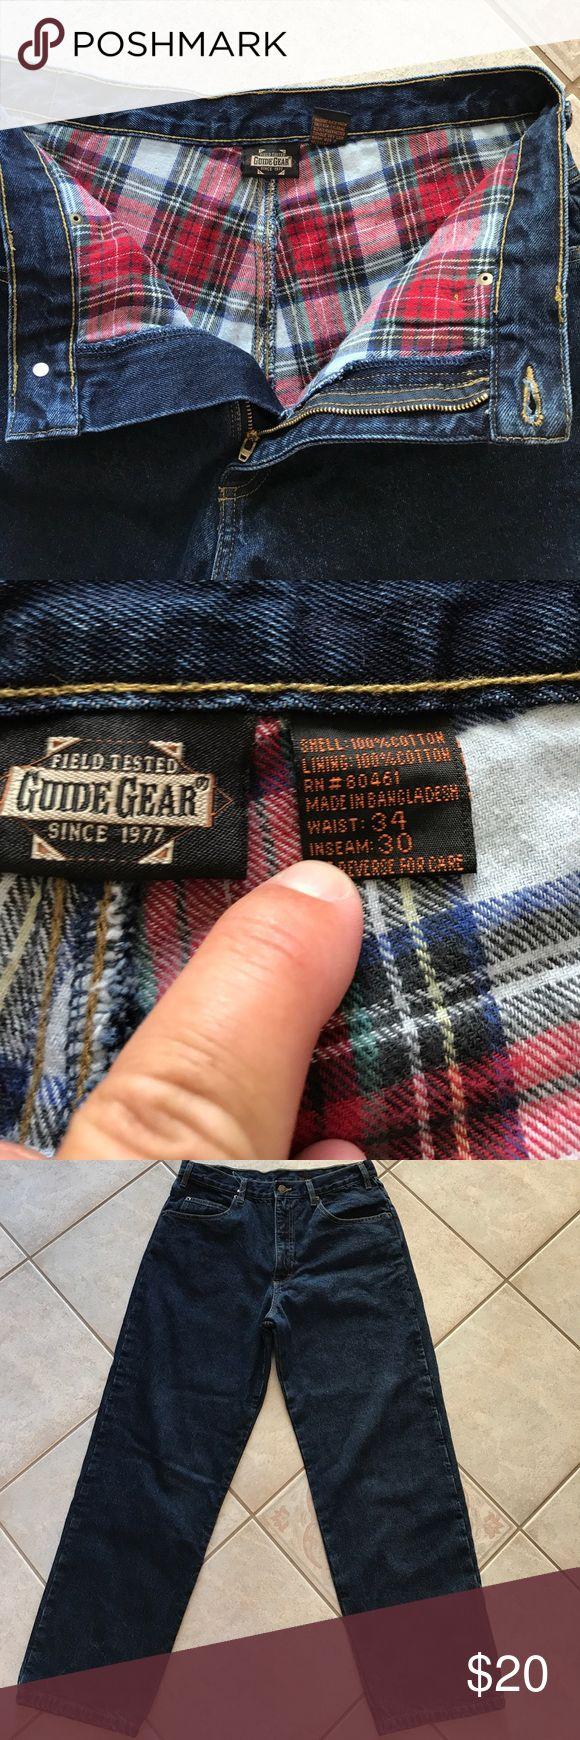 Guide Gear men's flannel lined jeans size 34x30 NWOT. Men's flannel lined jeans, dark wash. Any questions please ask size 34 x 30 Guide Gear Jeans